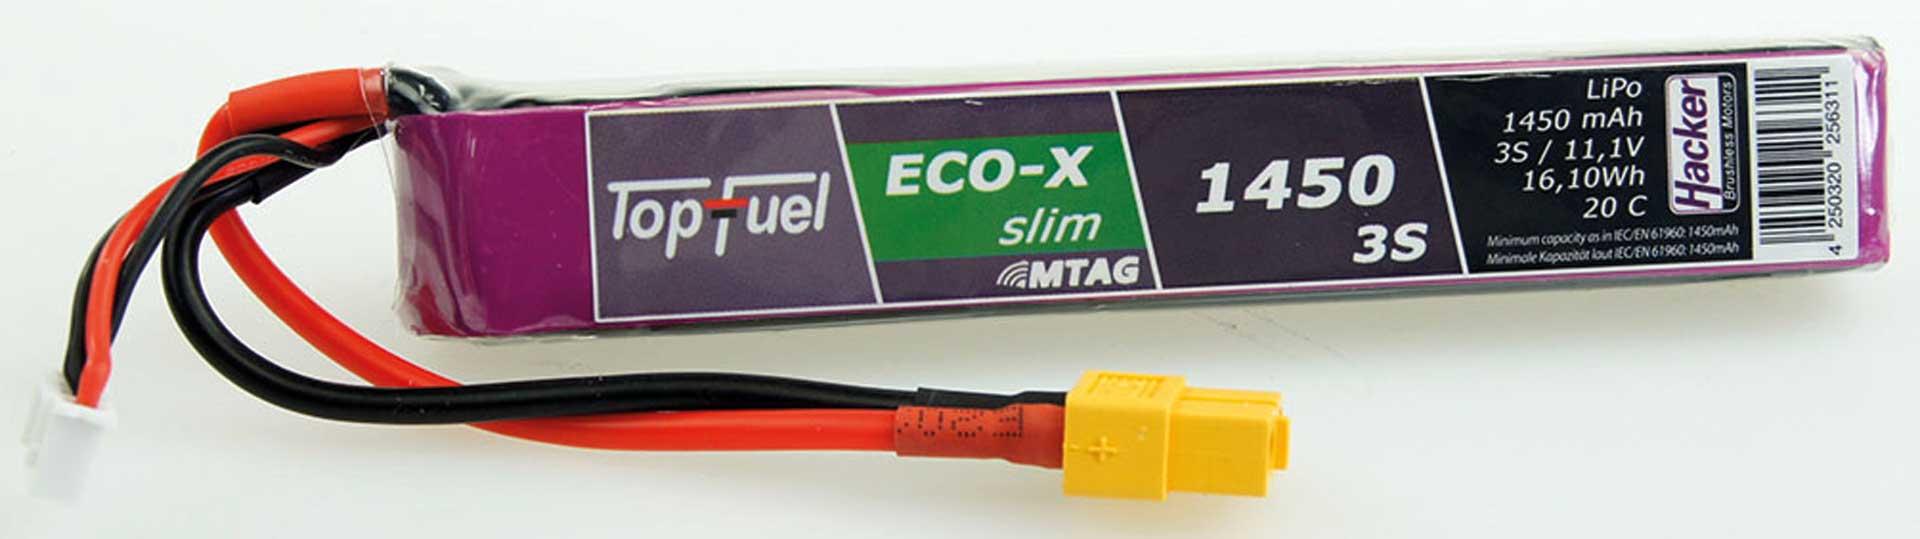 HACKER TopFuel LiPo 20C ECO-X Slim 1450mAh 3S 11,1V MTAG